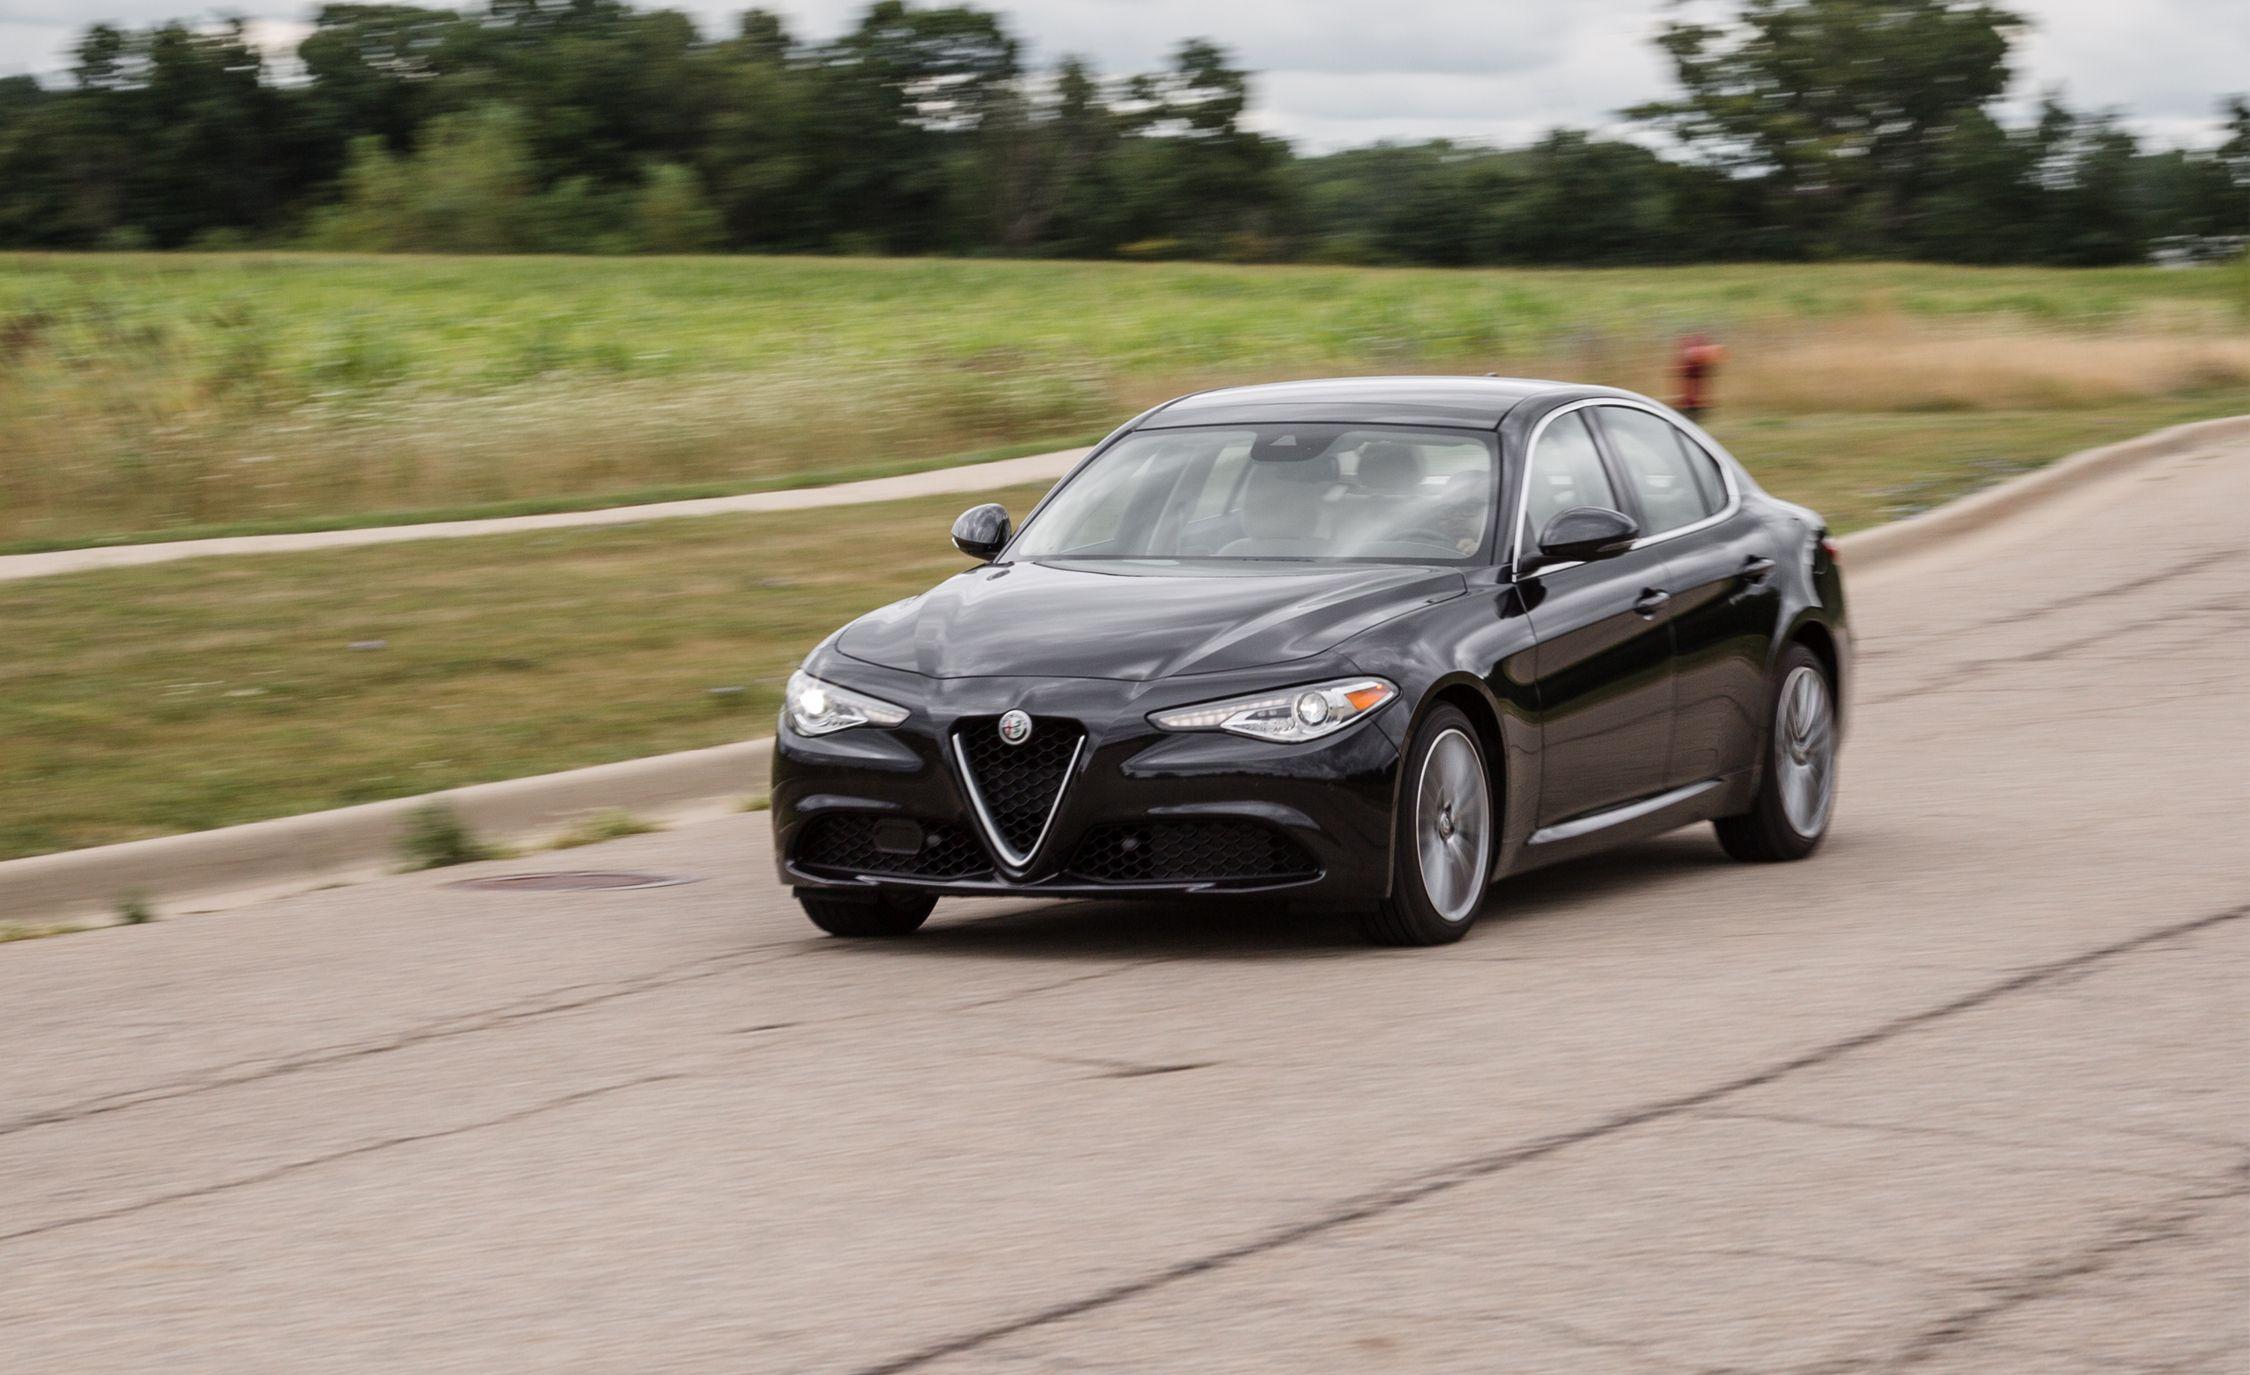 Alfa romeo giulia ti review car and driver 14